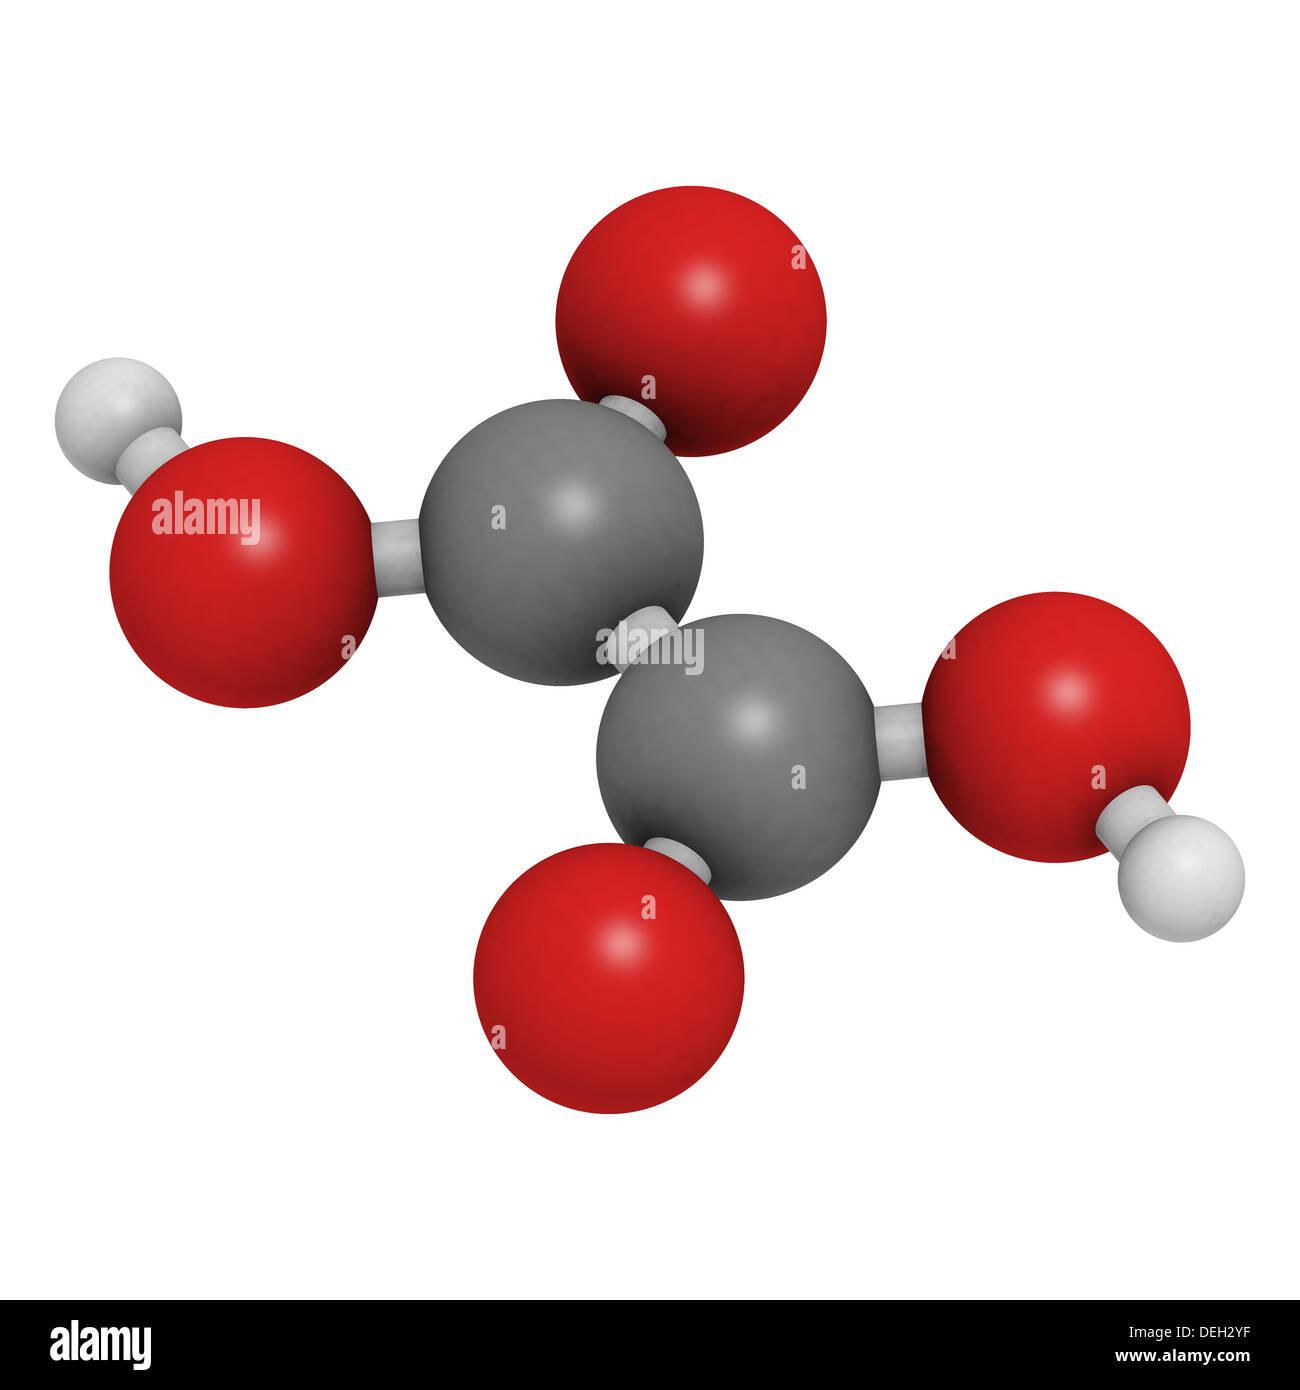 mol cule d 39 acide oxalique son sel oxalate de calcium est le principal composant de la plupart. Black Bedroom Furniture Sets. Home Design Ideas